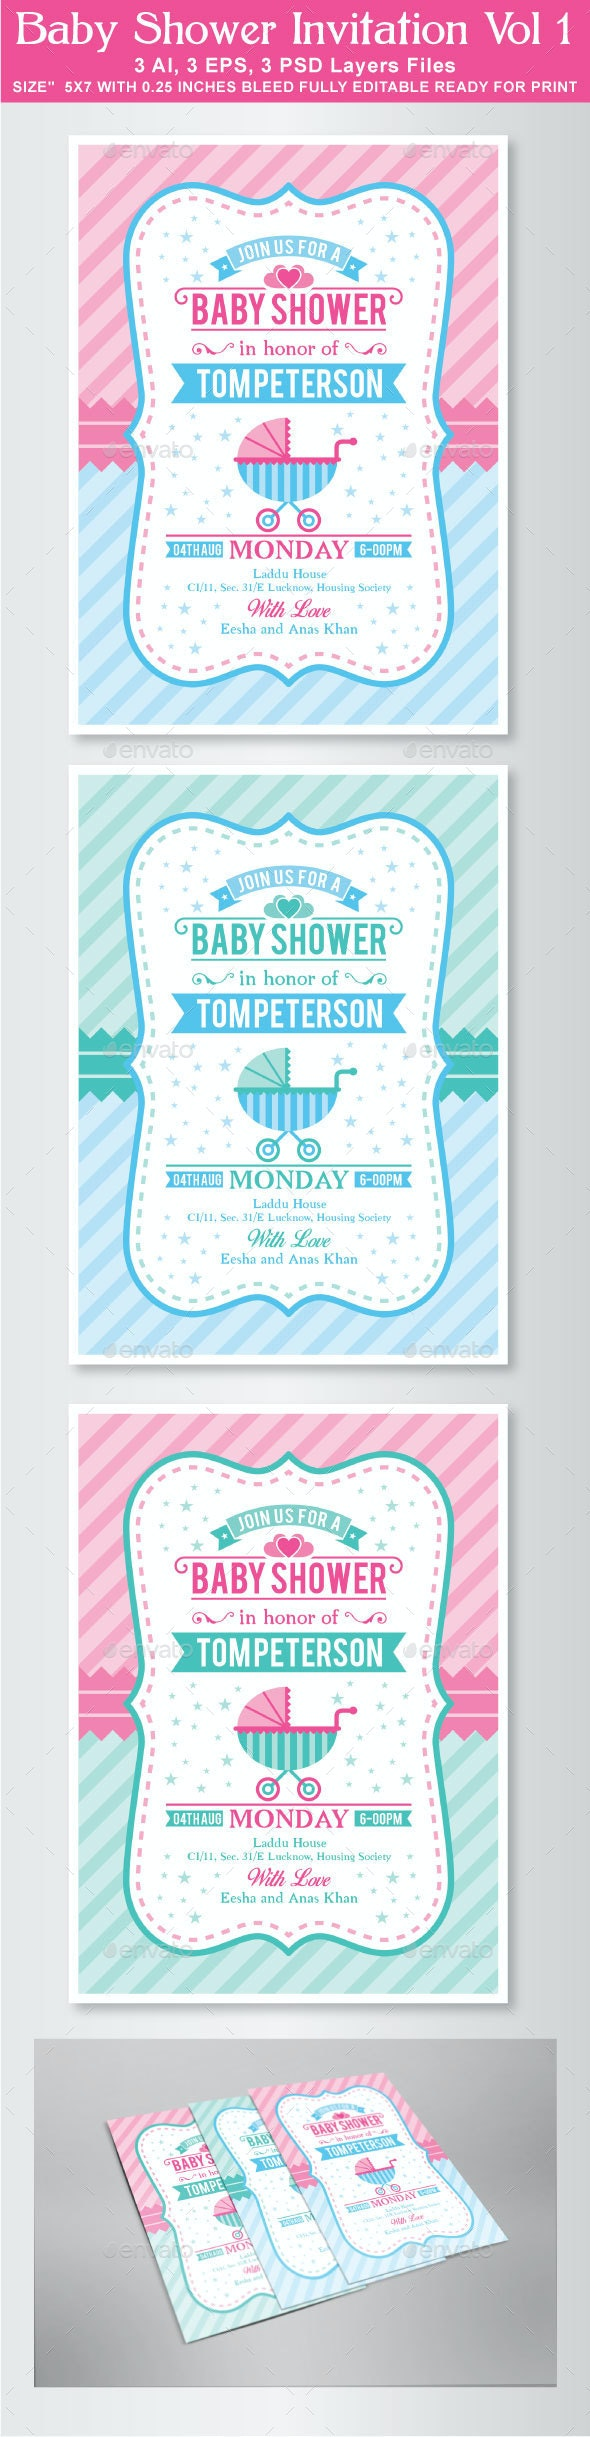 Baby Shower Invitation Vol 1 - Invitations Cards & Invites